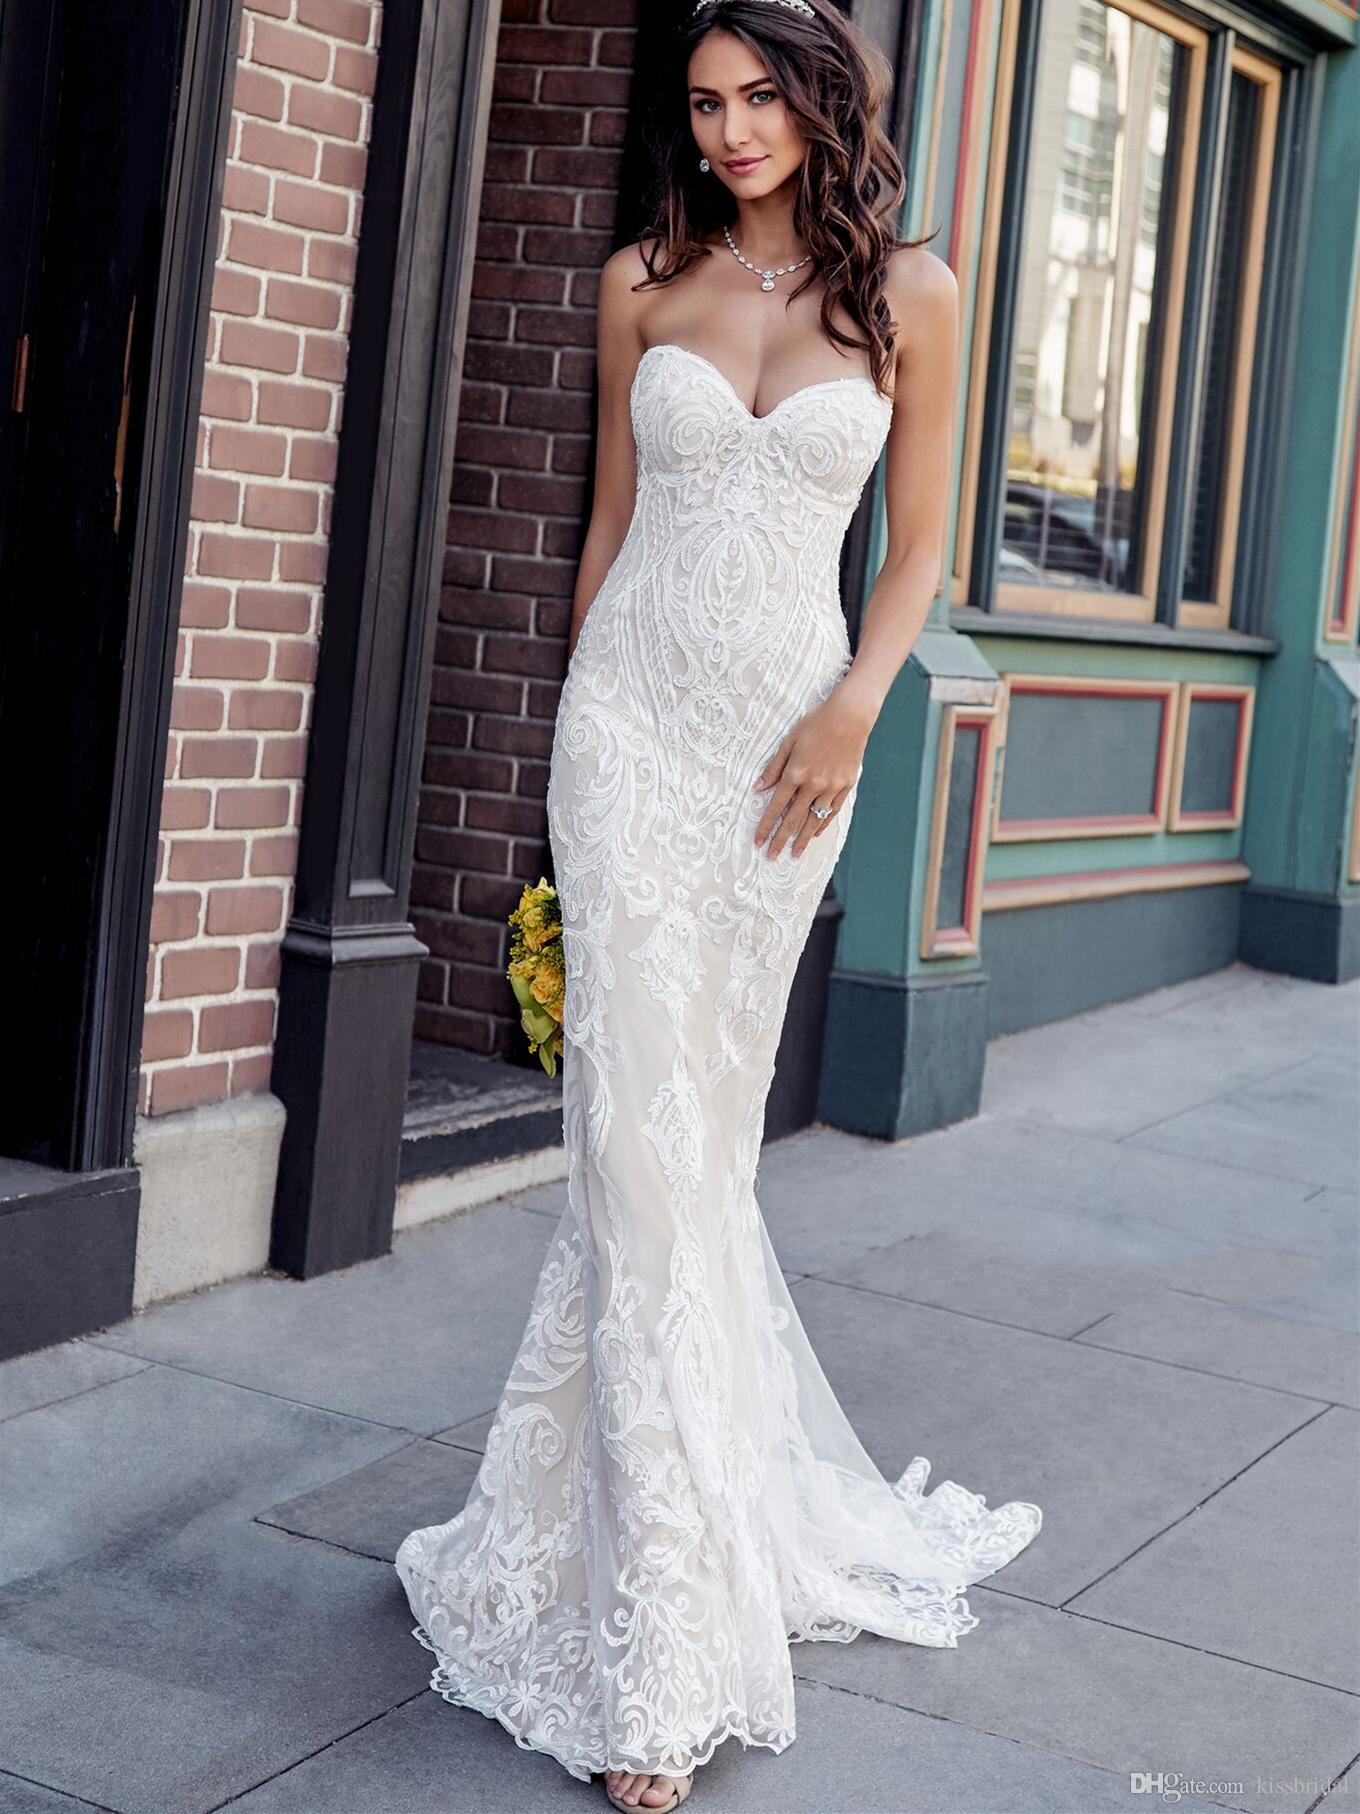 Mermaid Strapless Lace Wedding Dresses 2019 Elegant Bridal Gowns Vintage Formal Dress Gown Vestidos De Noiva Red Mermaid Wedding Dresses Ruched Mermaid Wedding Dress From Kissbridal 201 Dhgate Com